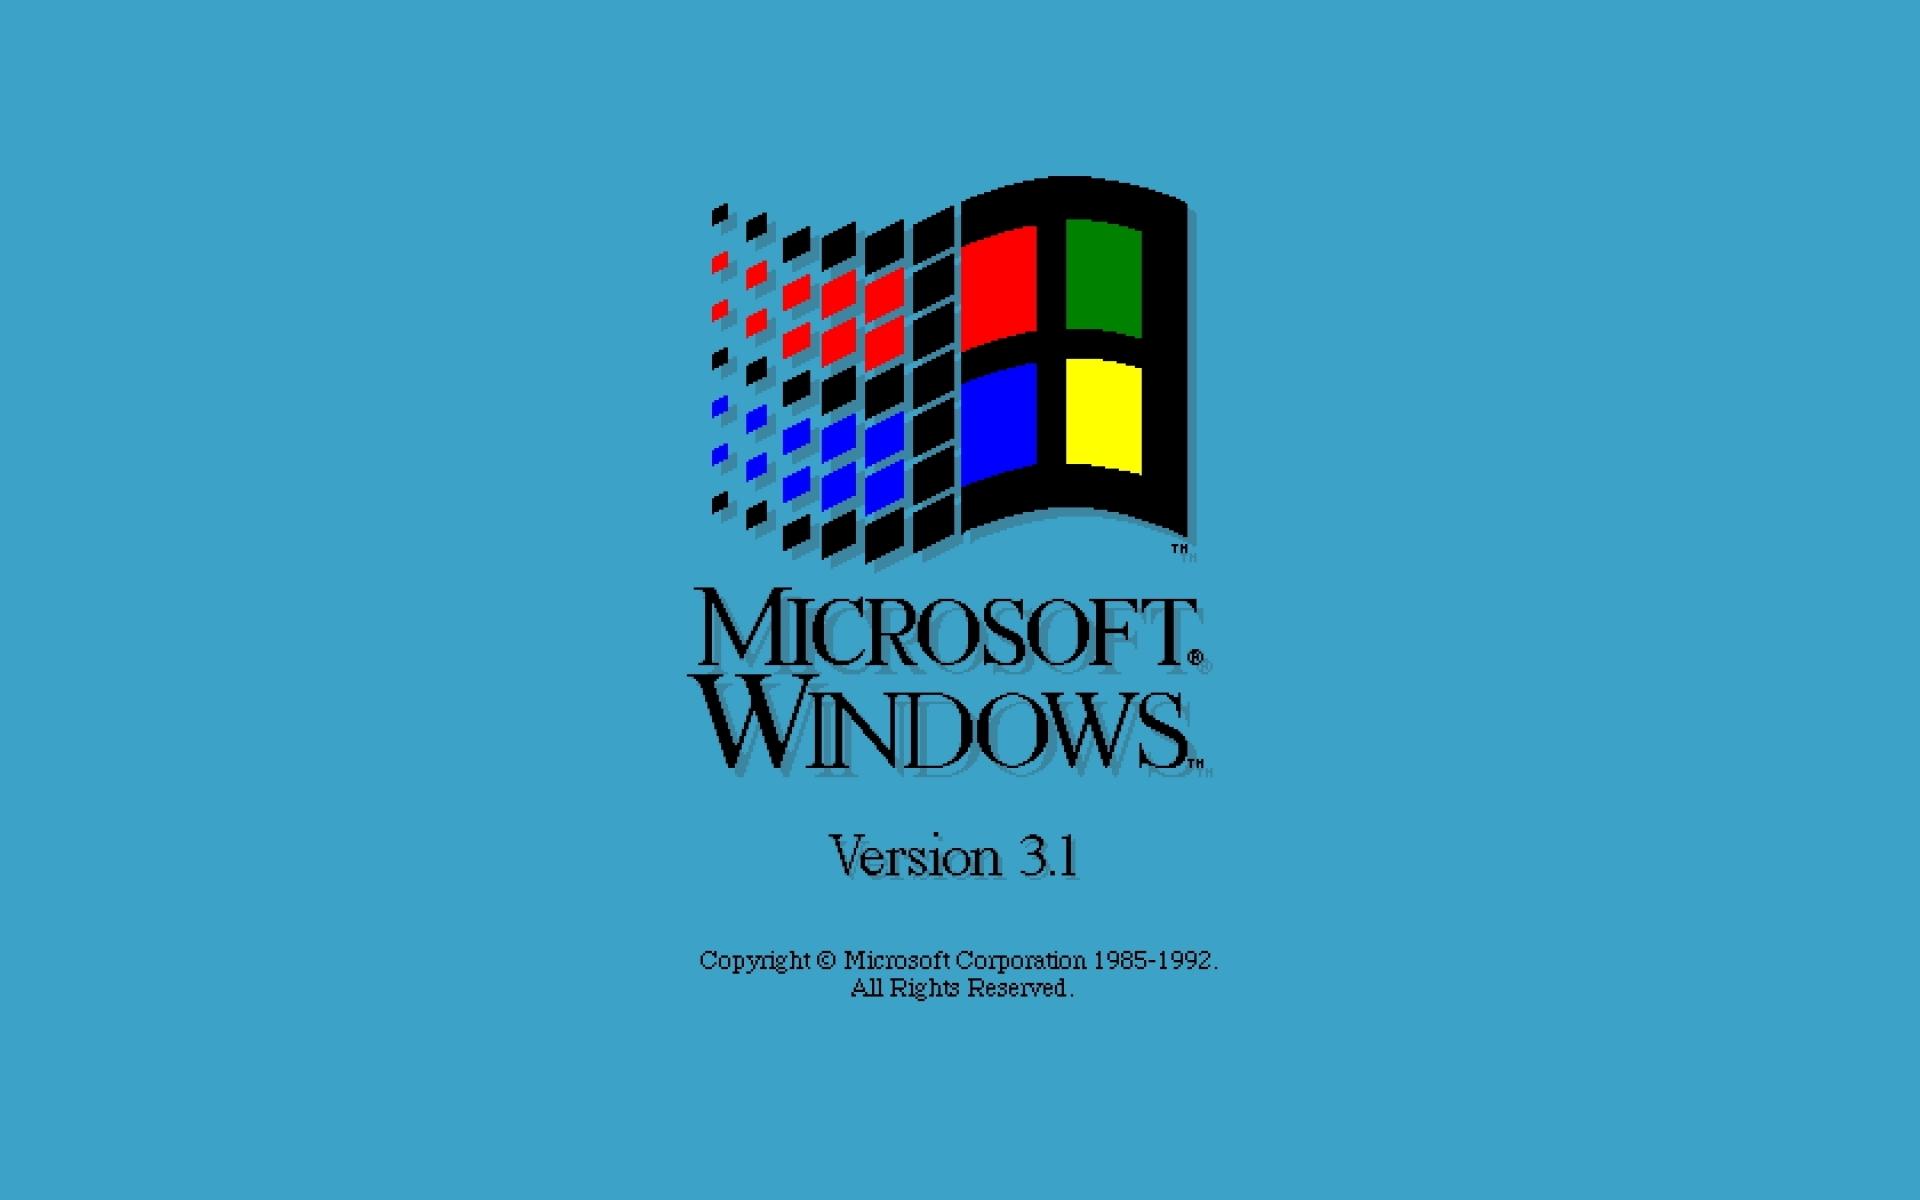 windows 8bit 1680x1050 wallpaper Wallpaper Wallpapers Download 1920x1200